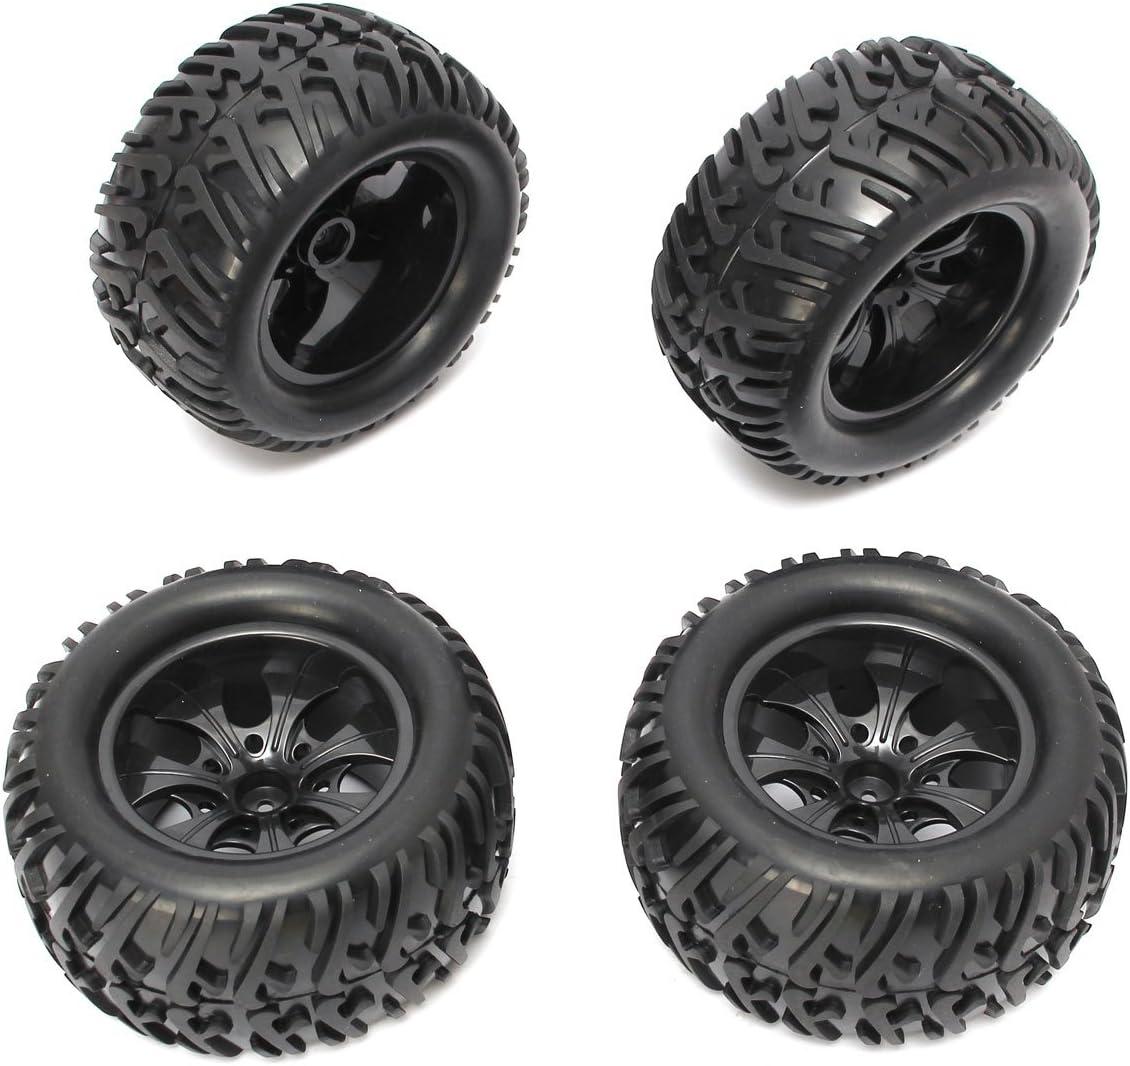 4pcs RC Flat Racing Tires Tyre Wheel Rim Fit HSP HPI 1:10 On-Road Car 6031-8010